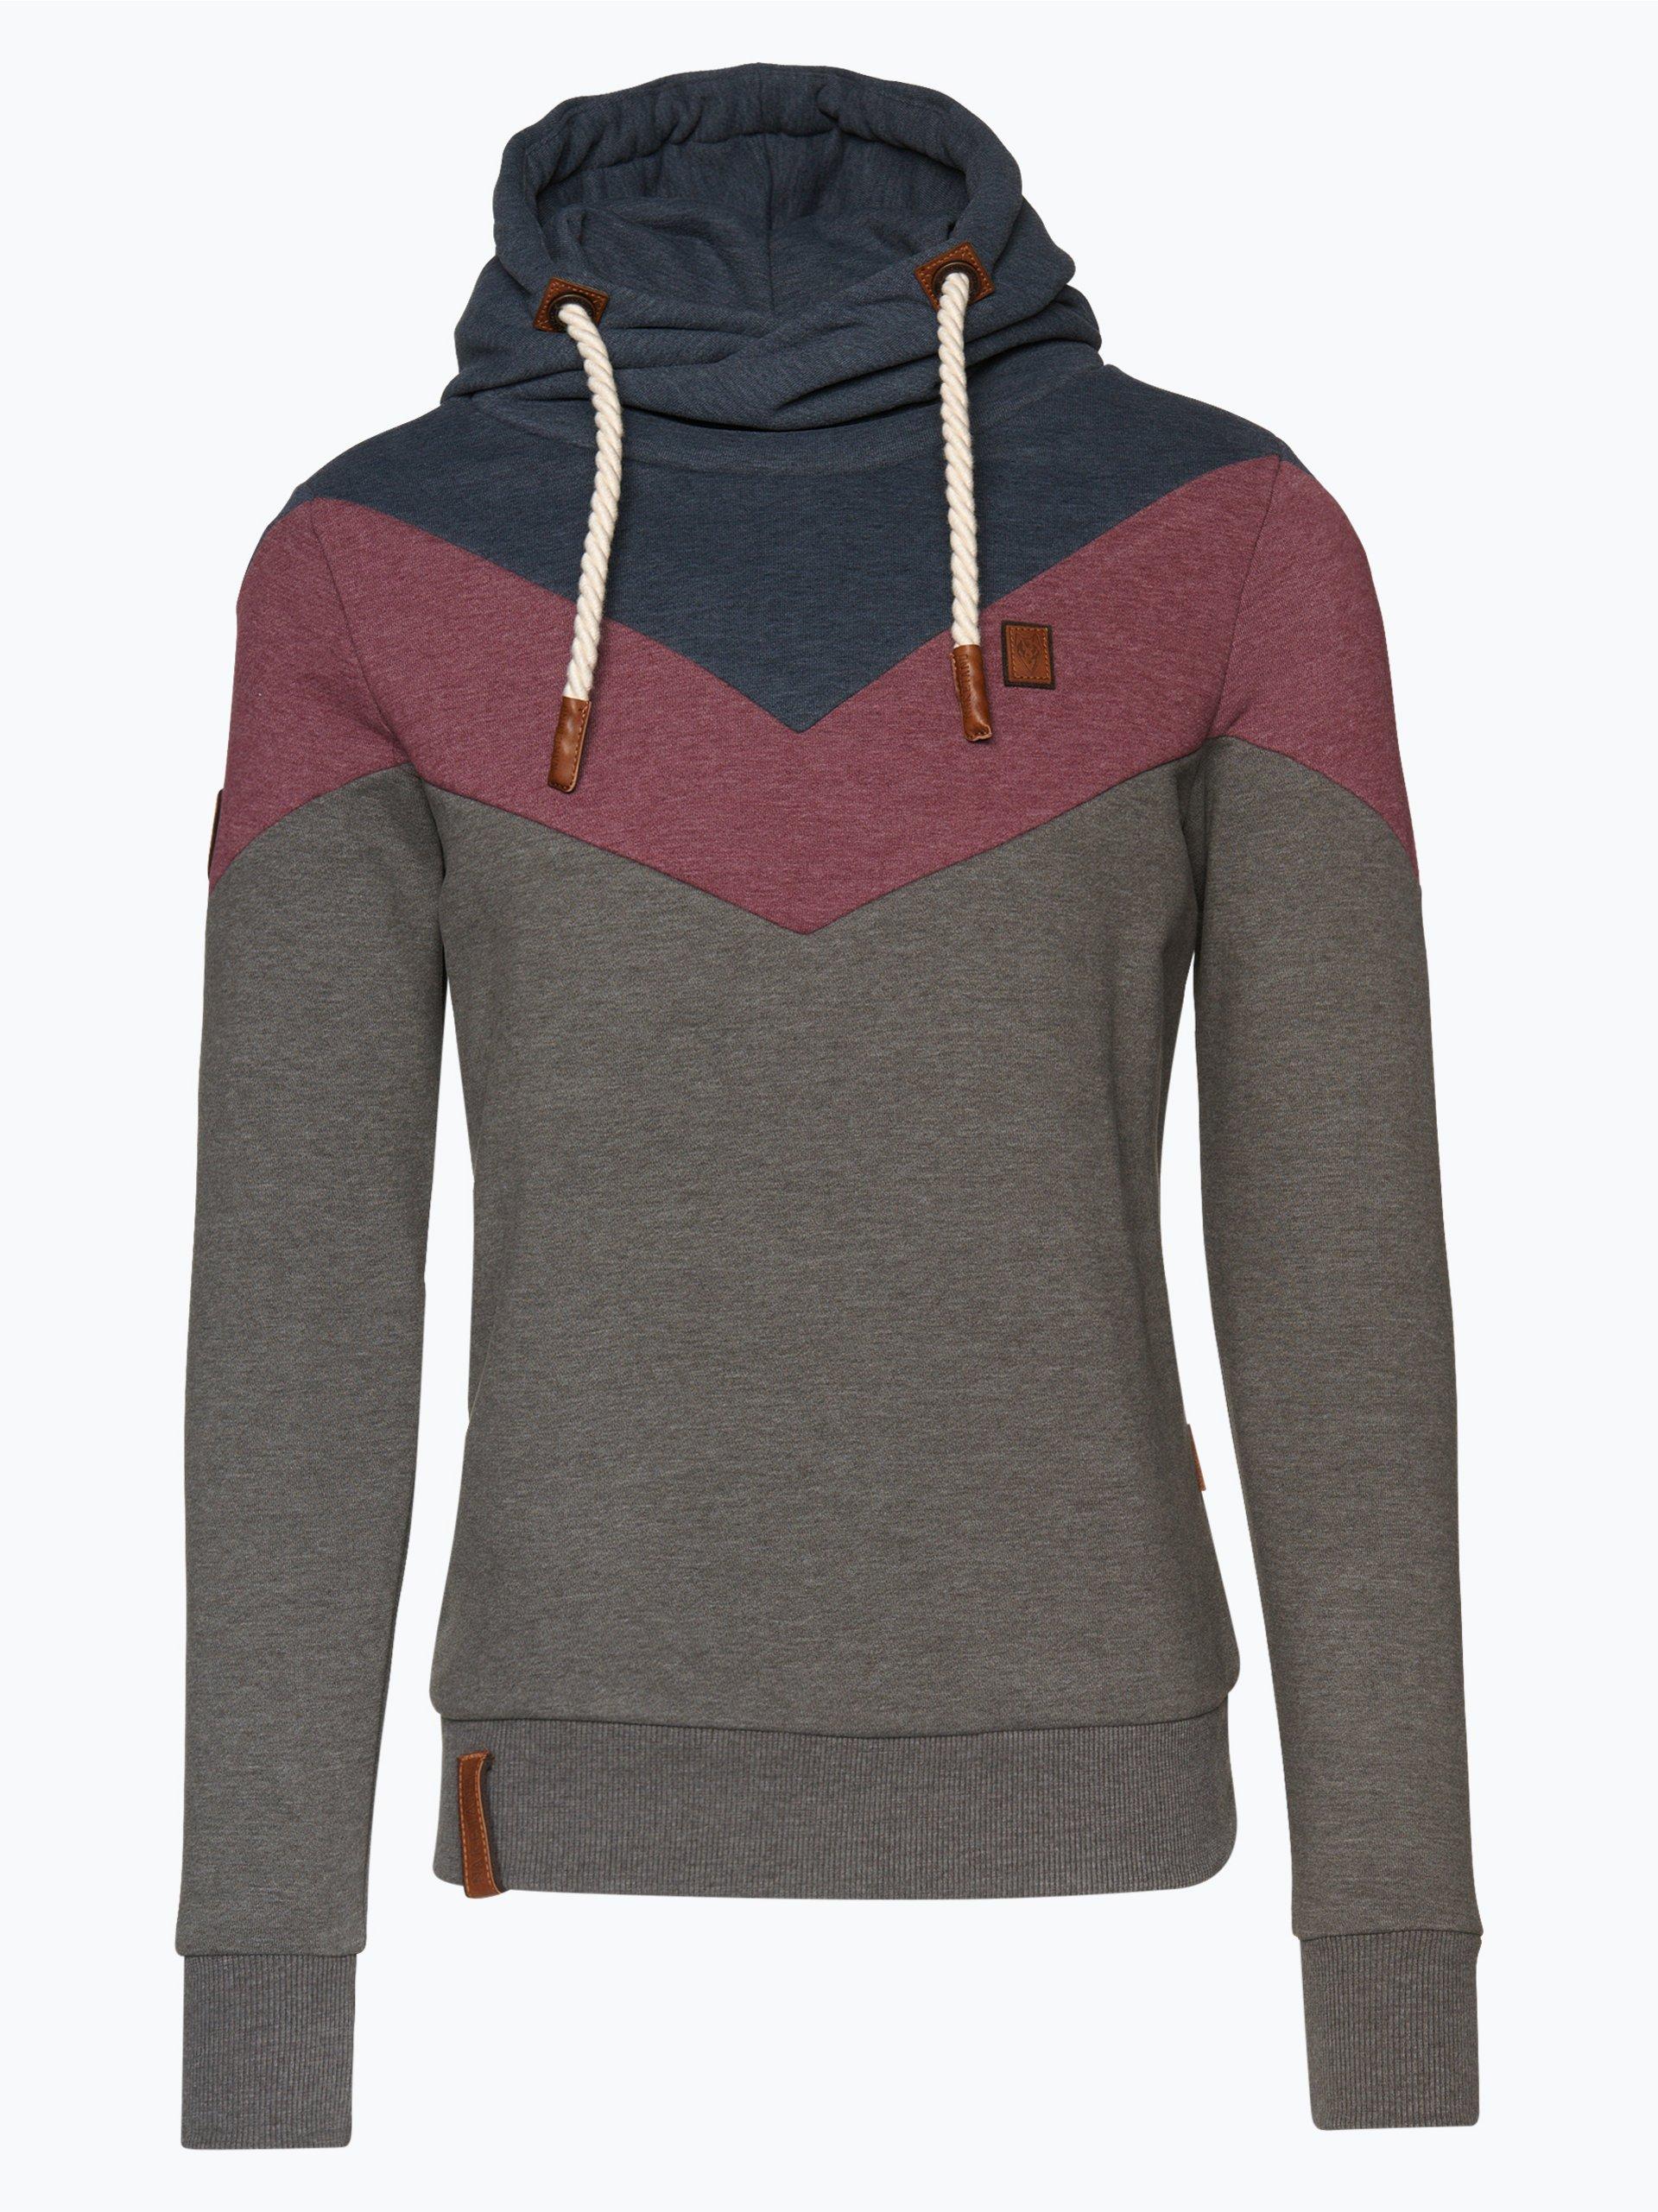 naketano herren sweatshirt anthrazit uni online kaufen. Black Bedroom Furniture Sets. Home Design Ideas